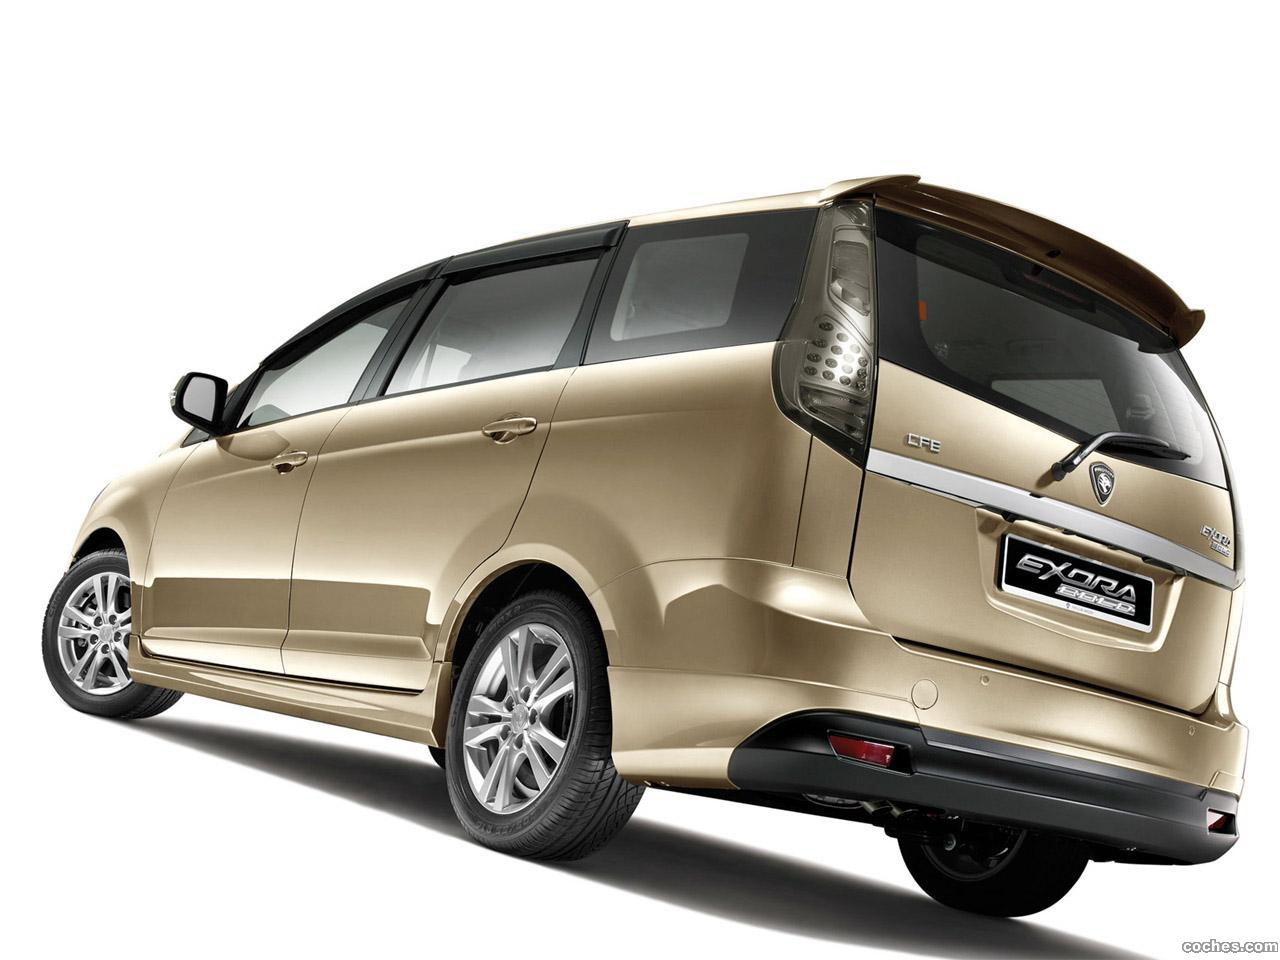 Foto 1 de Proton Exora Bold Premium 2011